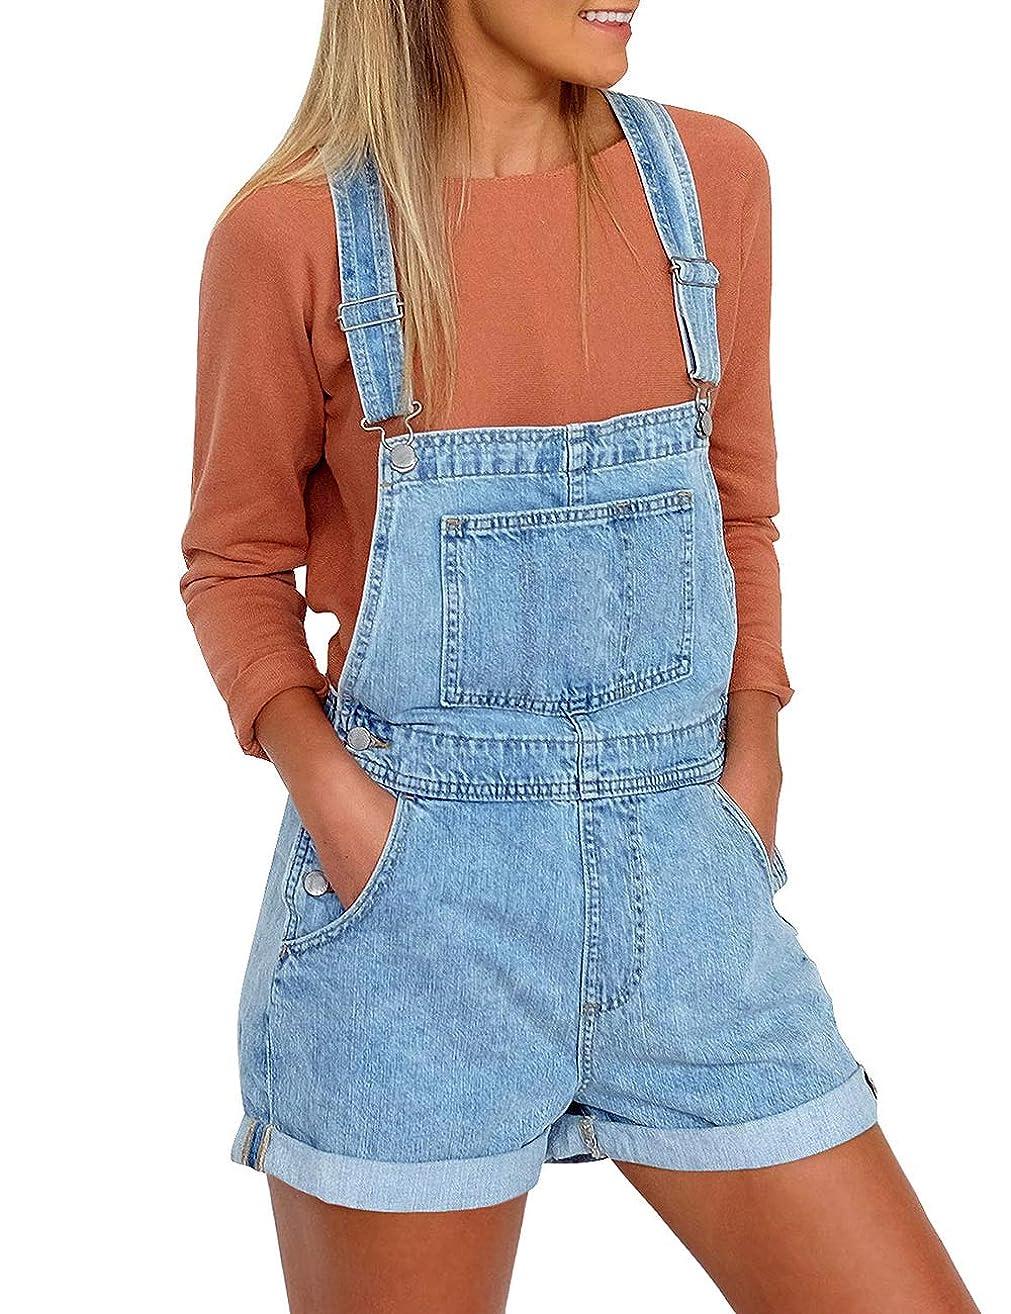 Utyful Women's Adjustable Straps Denim Bib Overalls Shorts Roll Cuff Shortalls